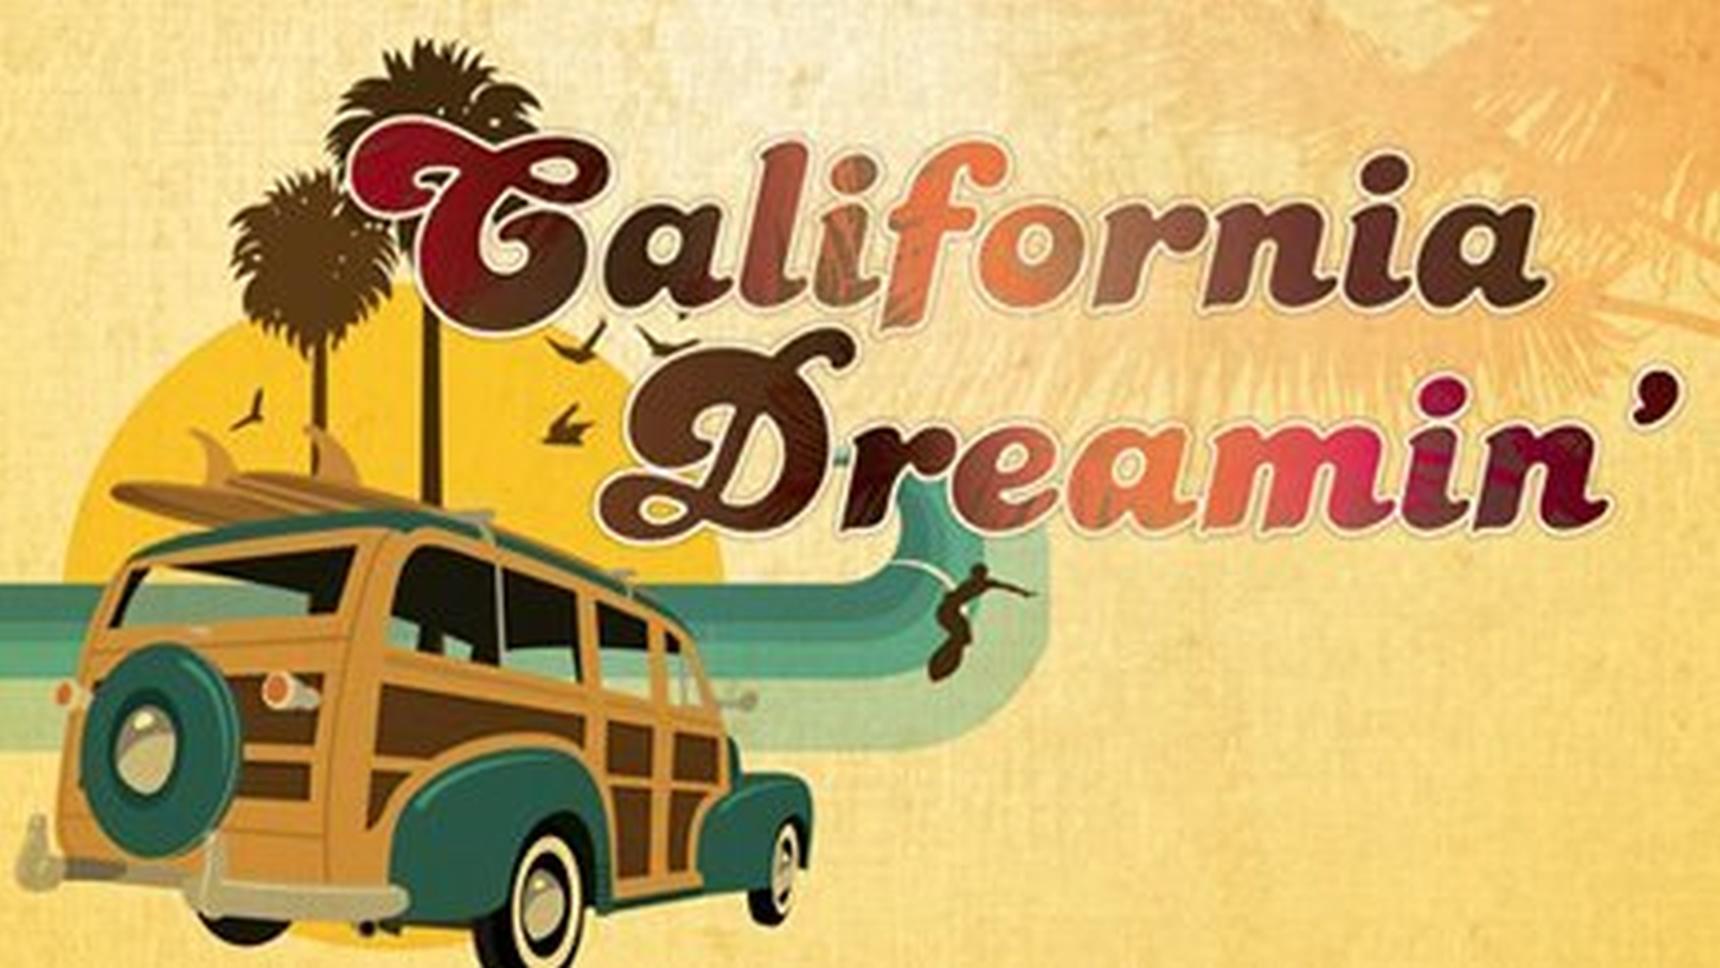 Carlifornia-Dreamin